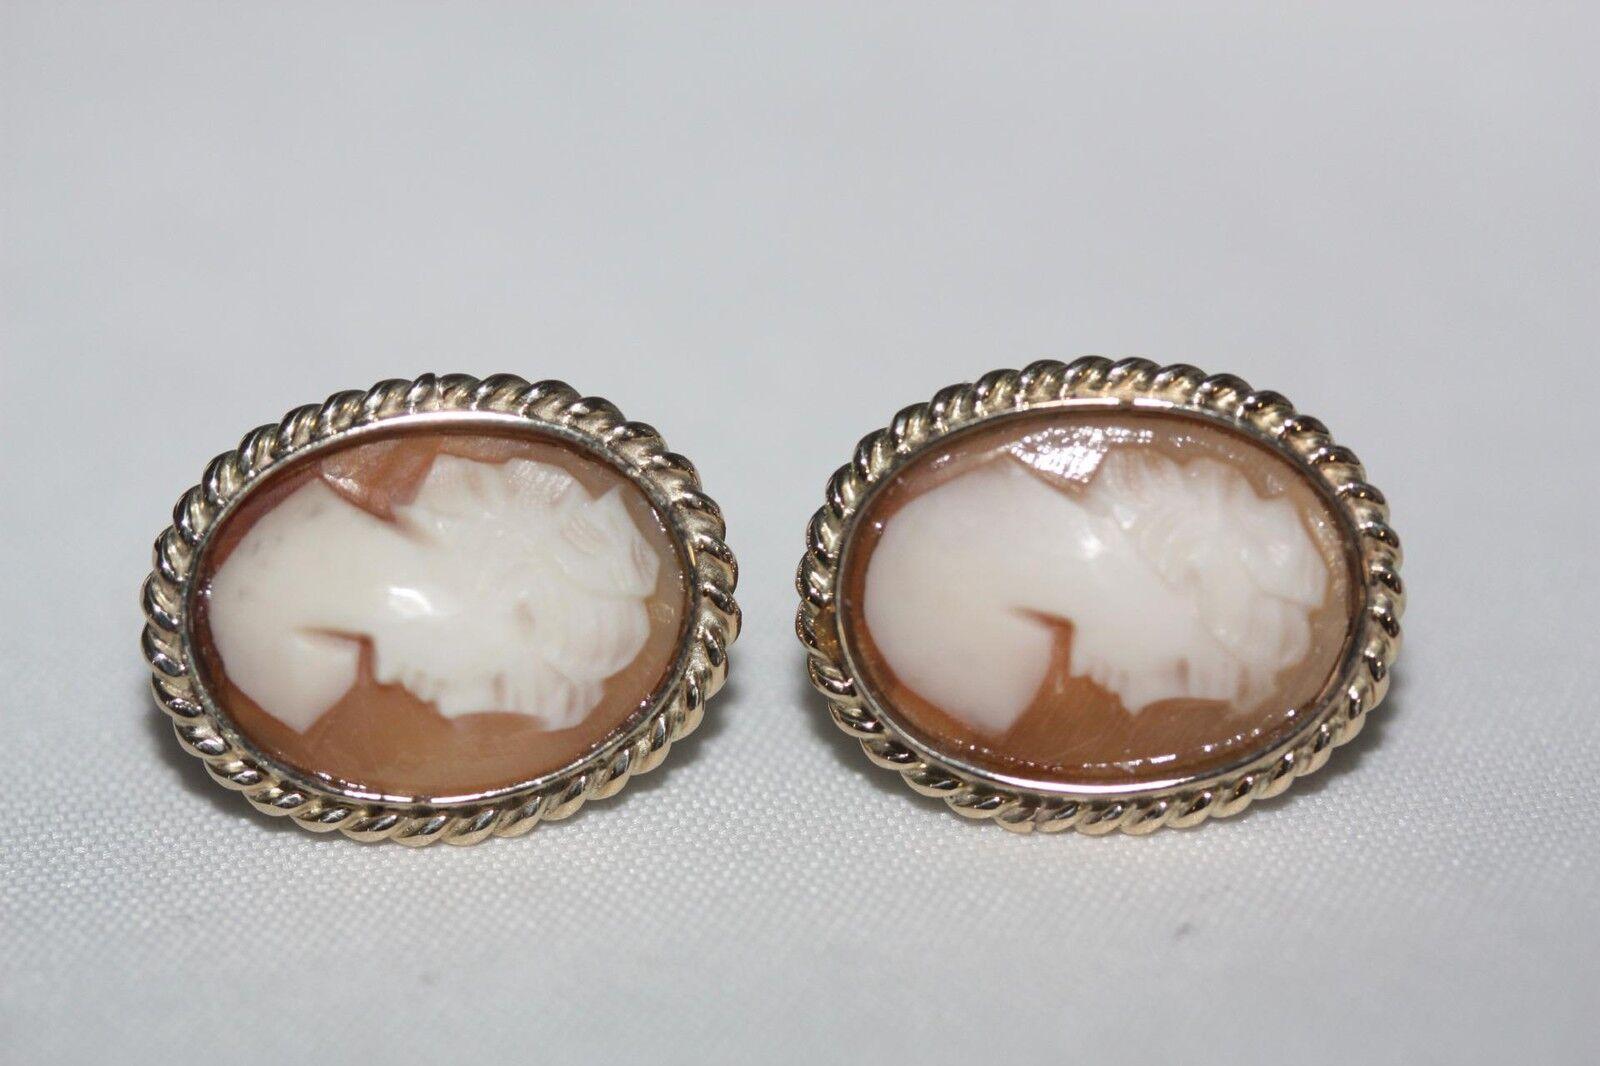 14k Yellow gold Cameo Earrings for Pierced ears Vintage Fine Jewelry